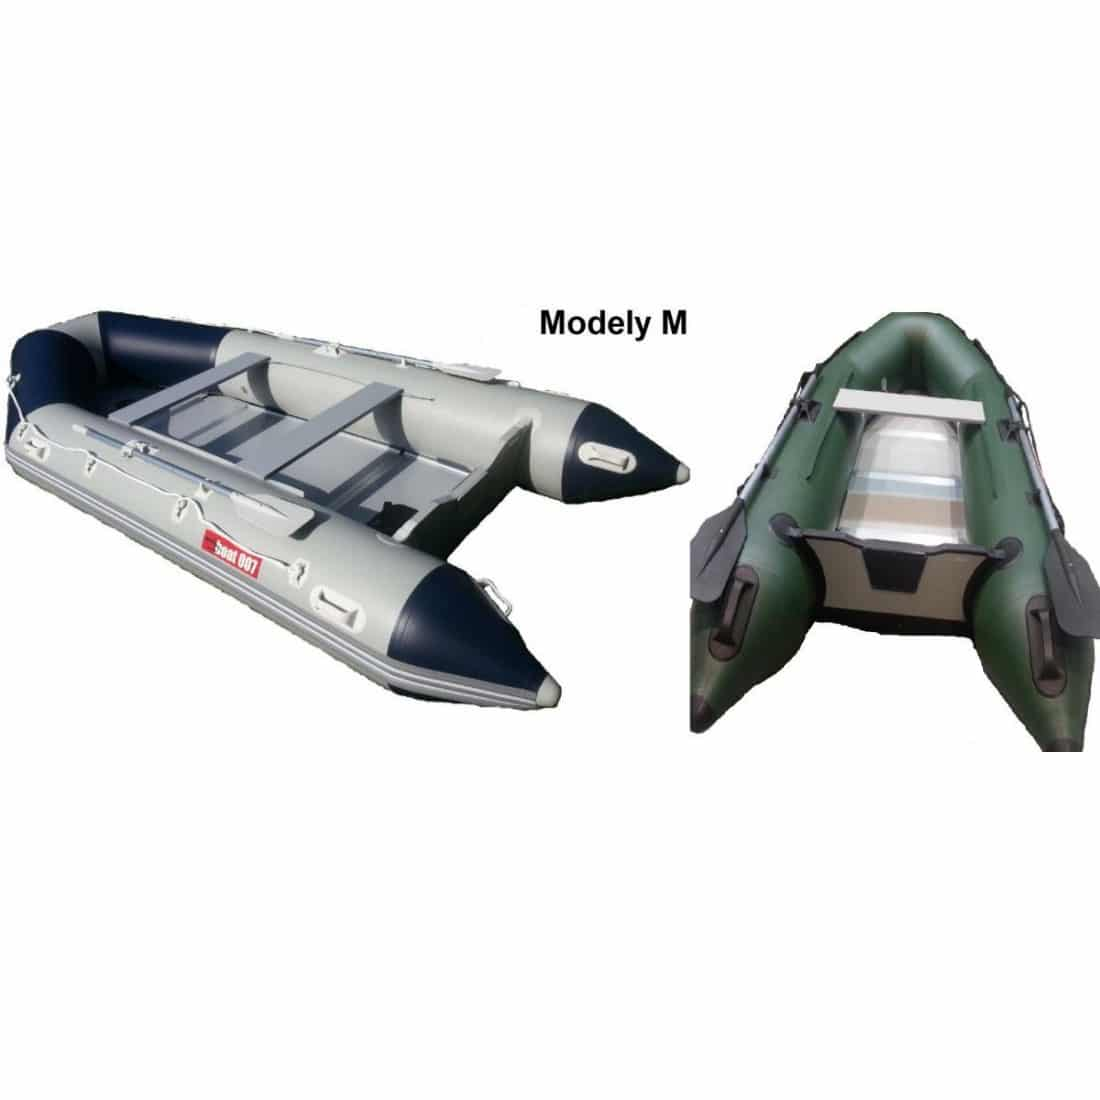 10208 13924544841 - M 360 - nafukovacie člny boat007